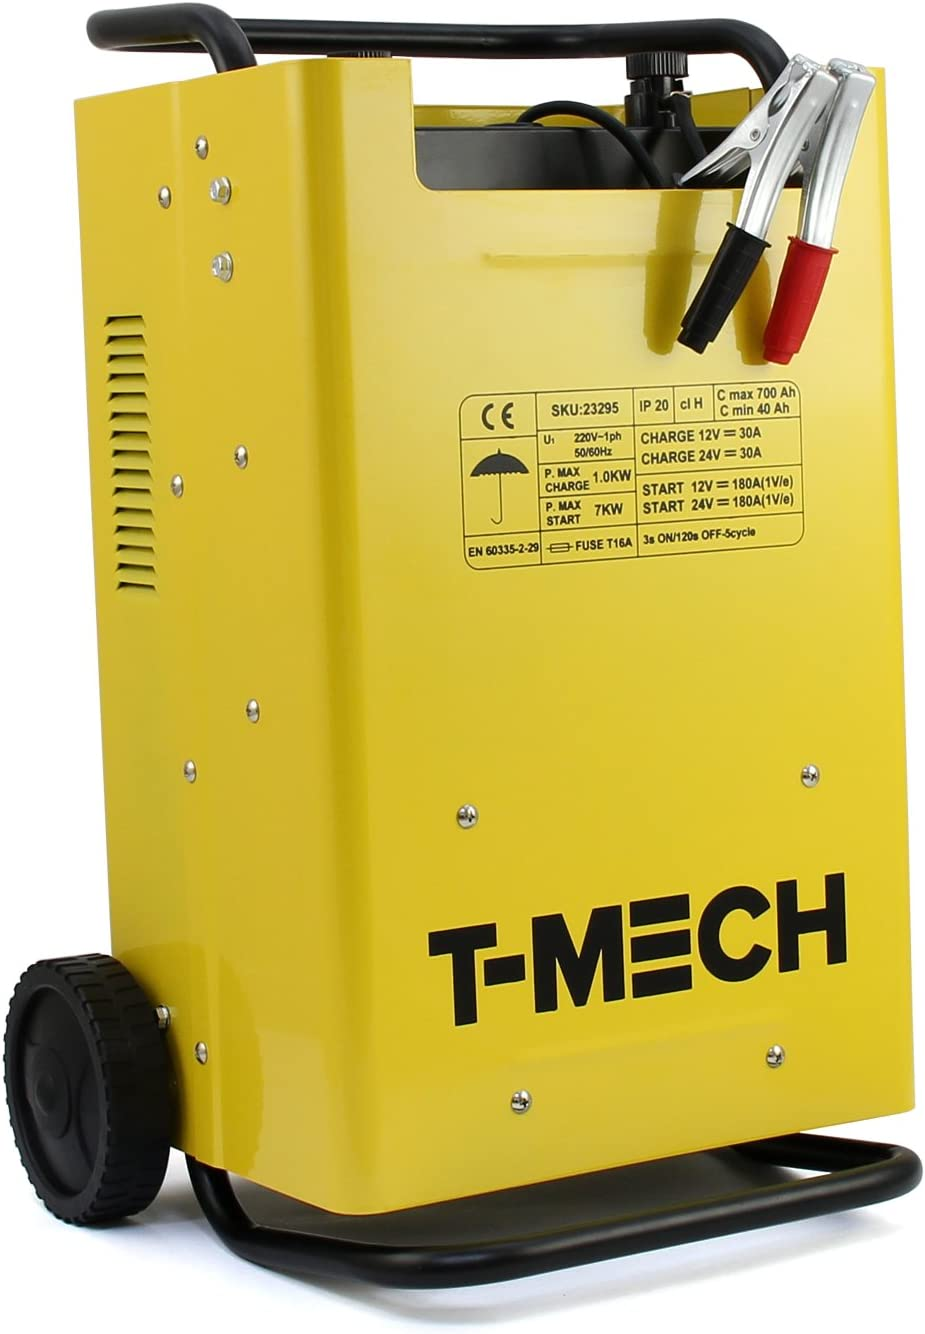 T-Mech MonsterShop Cargador de batería multifunción monofásico, 12V / 24V Cargadores de baterías para vehículos